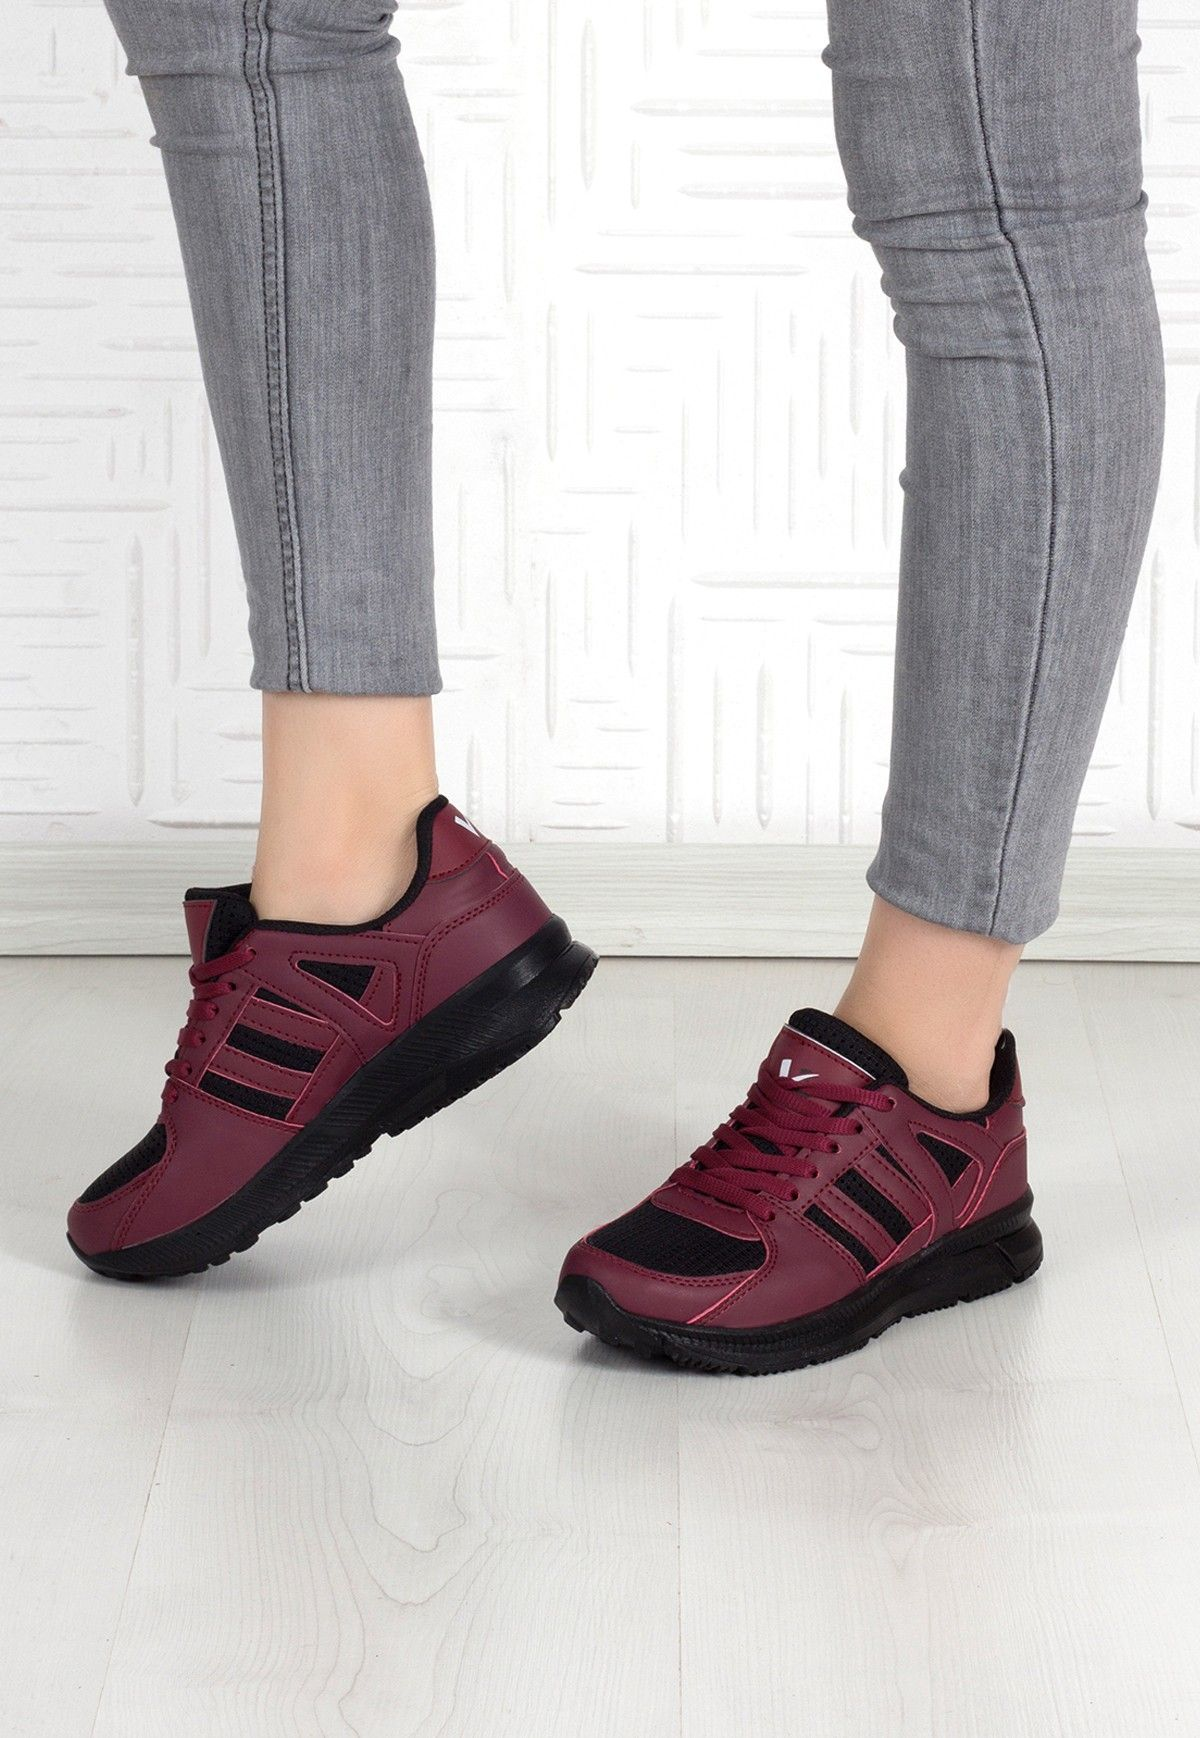 Indirimli Ayakkabi Adli Kullanicinin Shoes Panosundaki Pin Ayakkabilar Bayan Ayakkabi Siyah